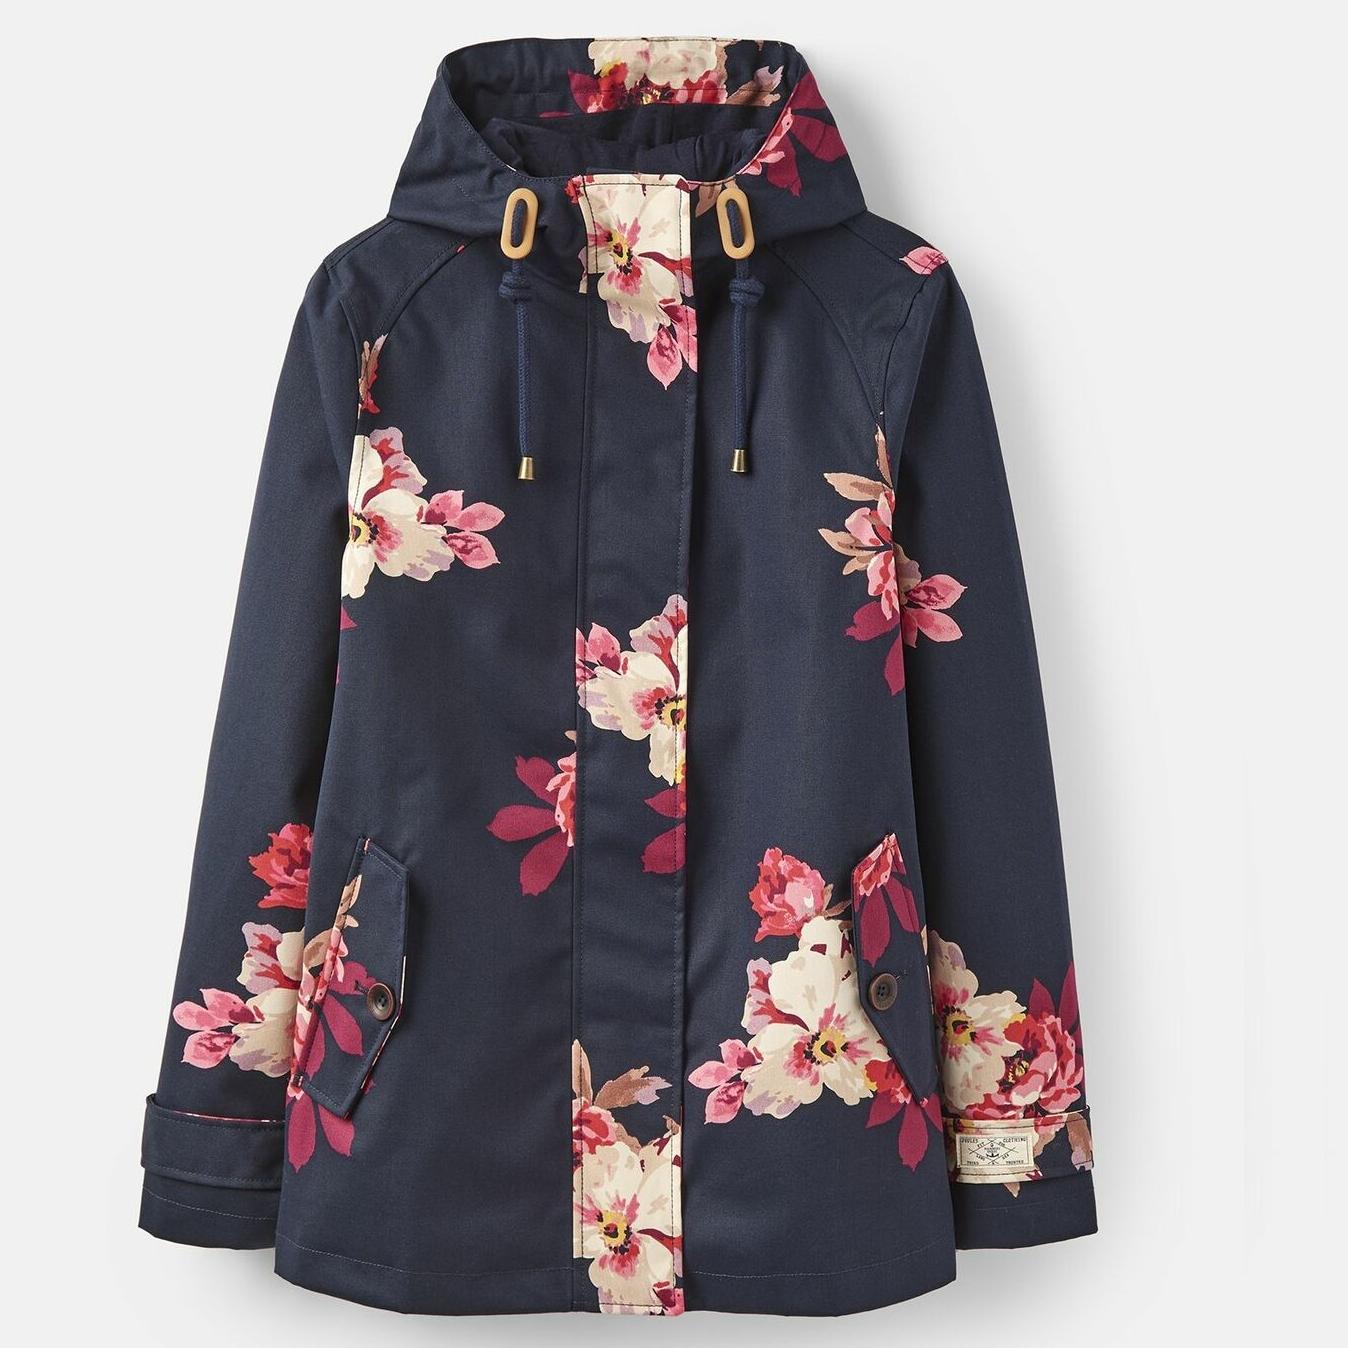 Joules 207520 Printed Waterproof Coat in Bircham Bloom £58.45 delivered with code @ Joules / eBay